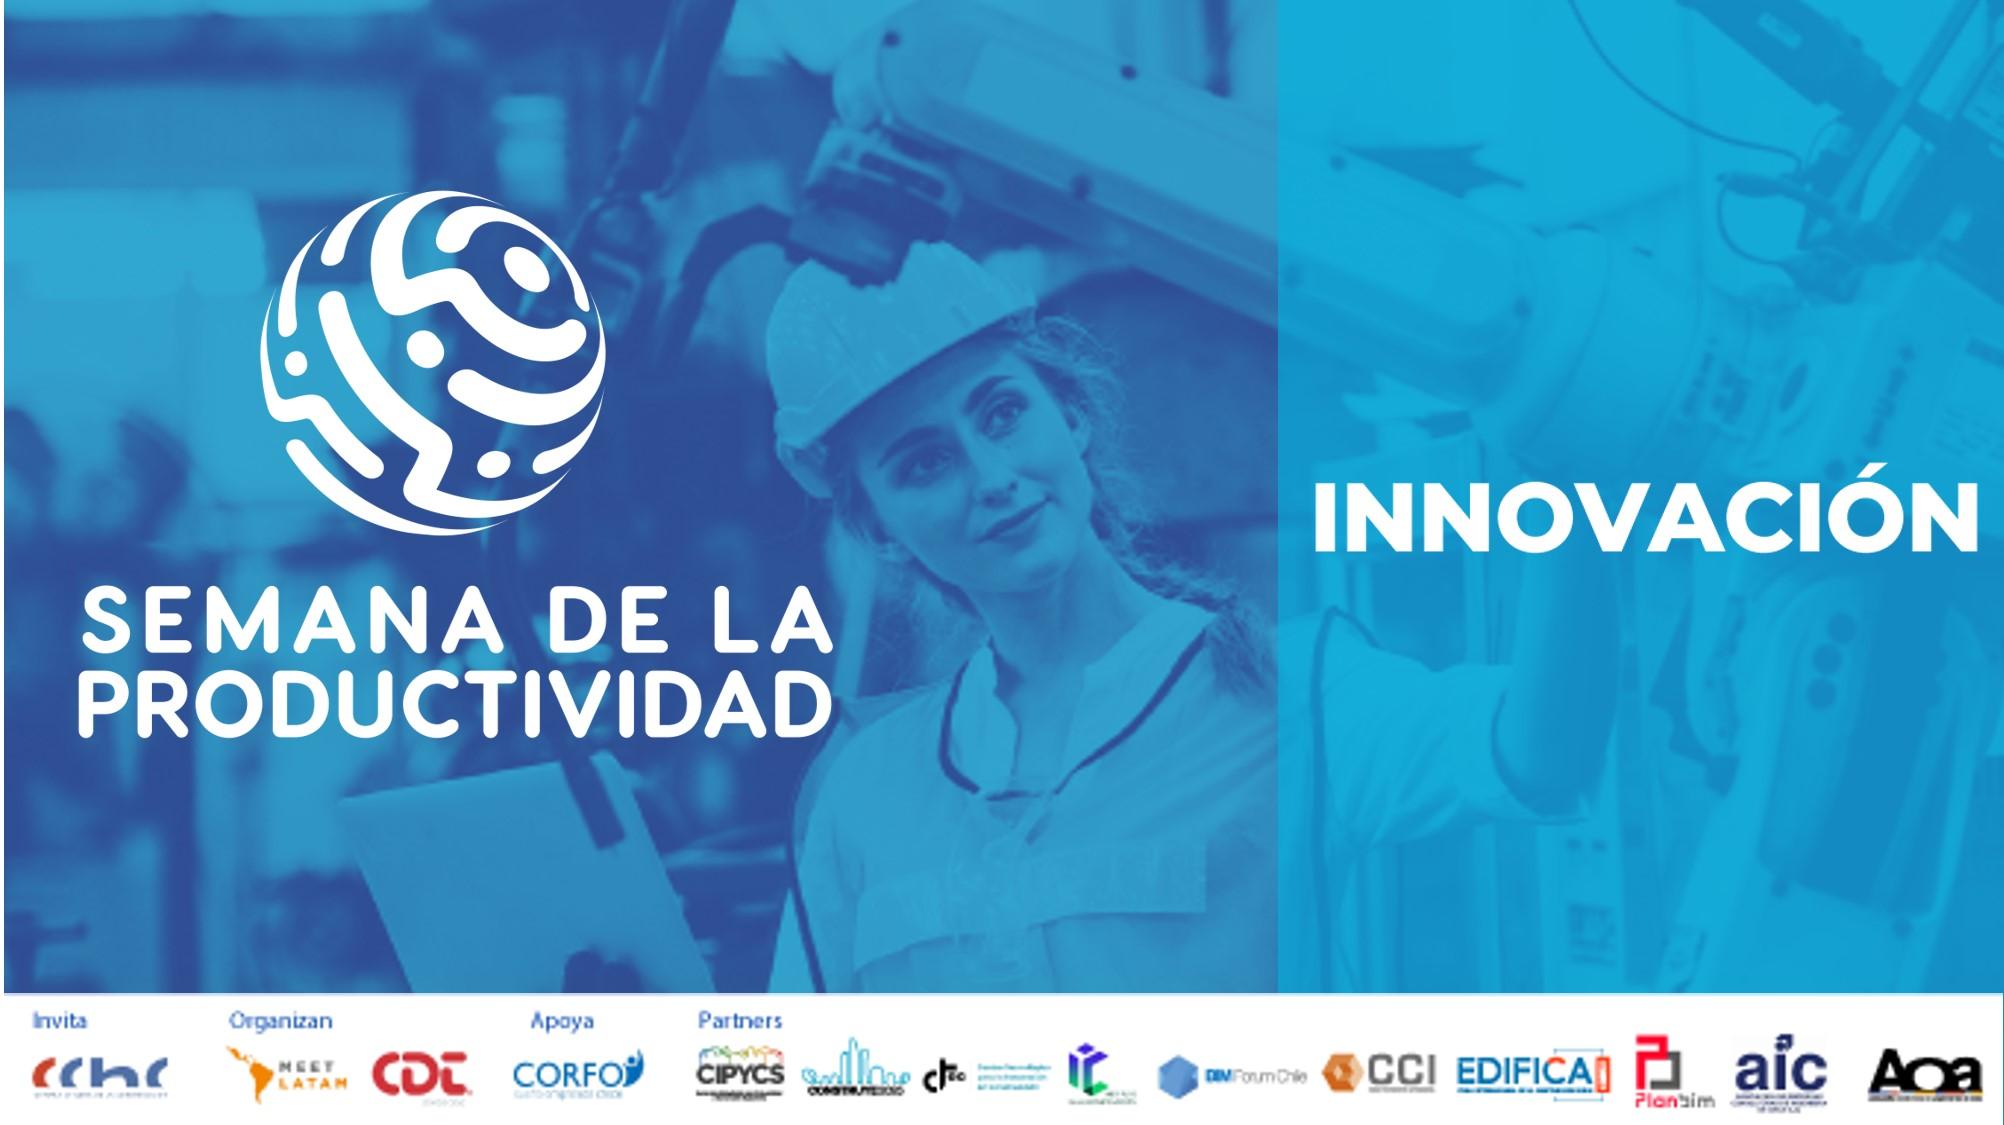 innovaci%C3%B3n.jpg